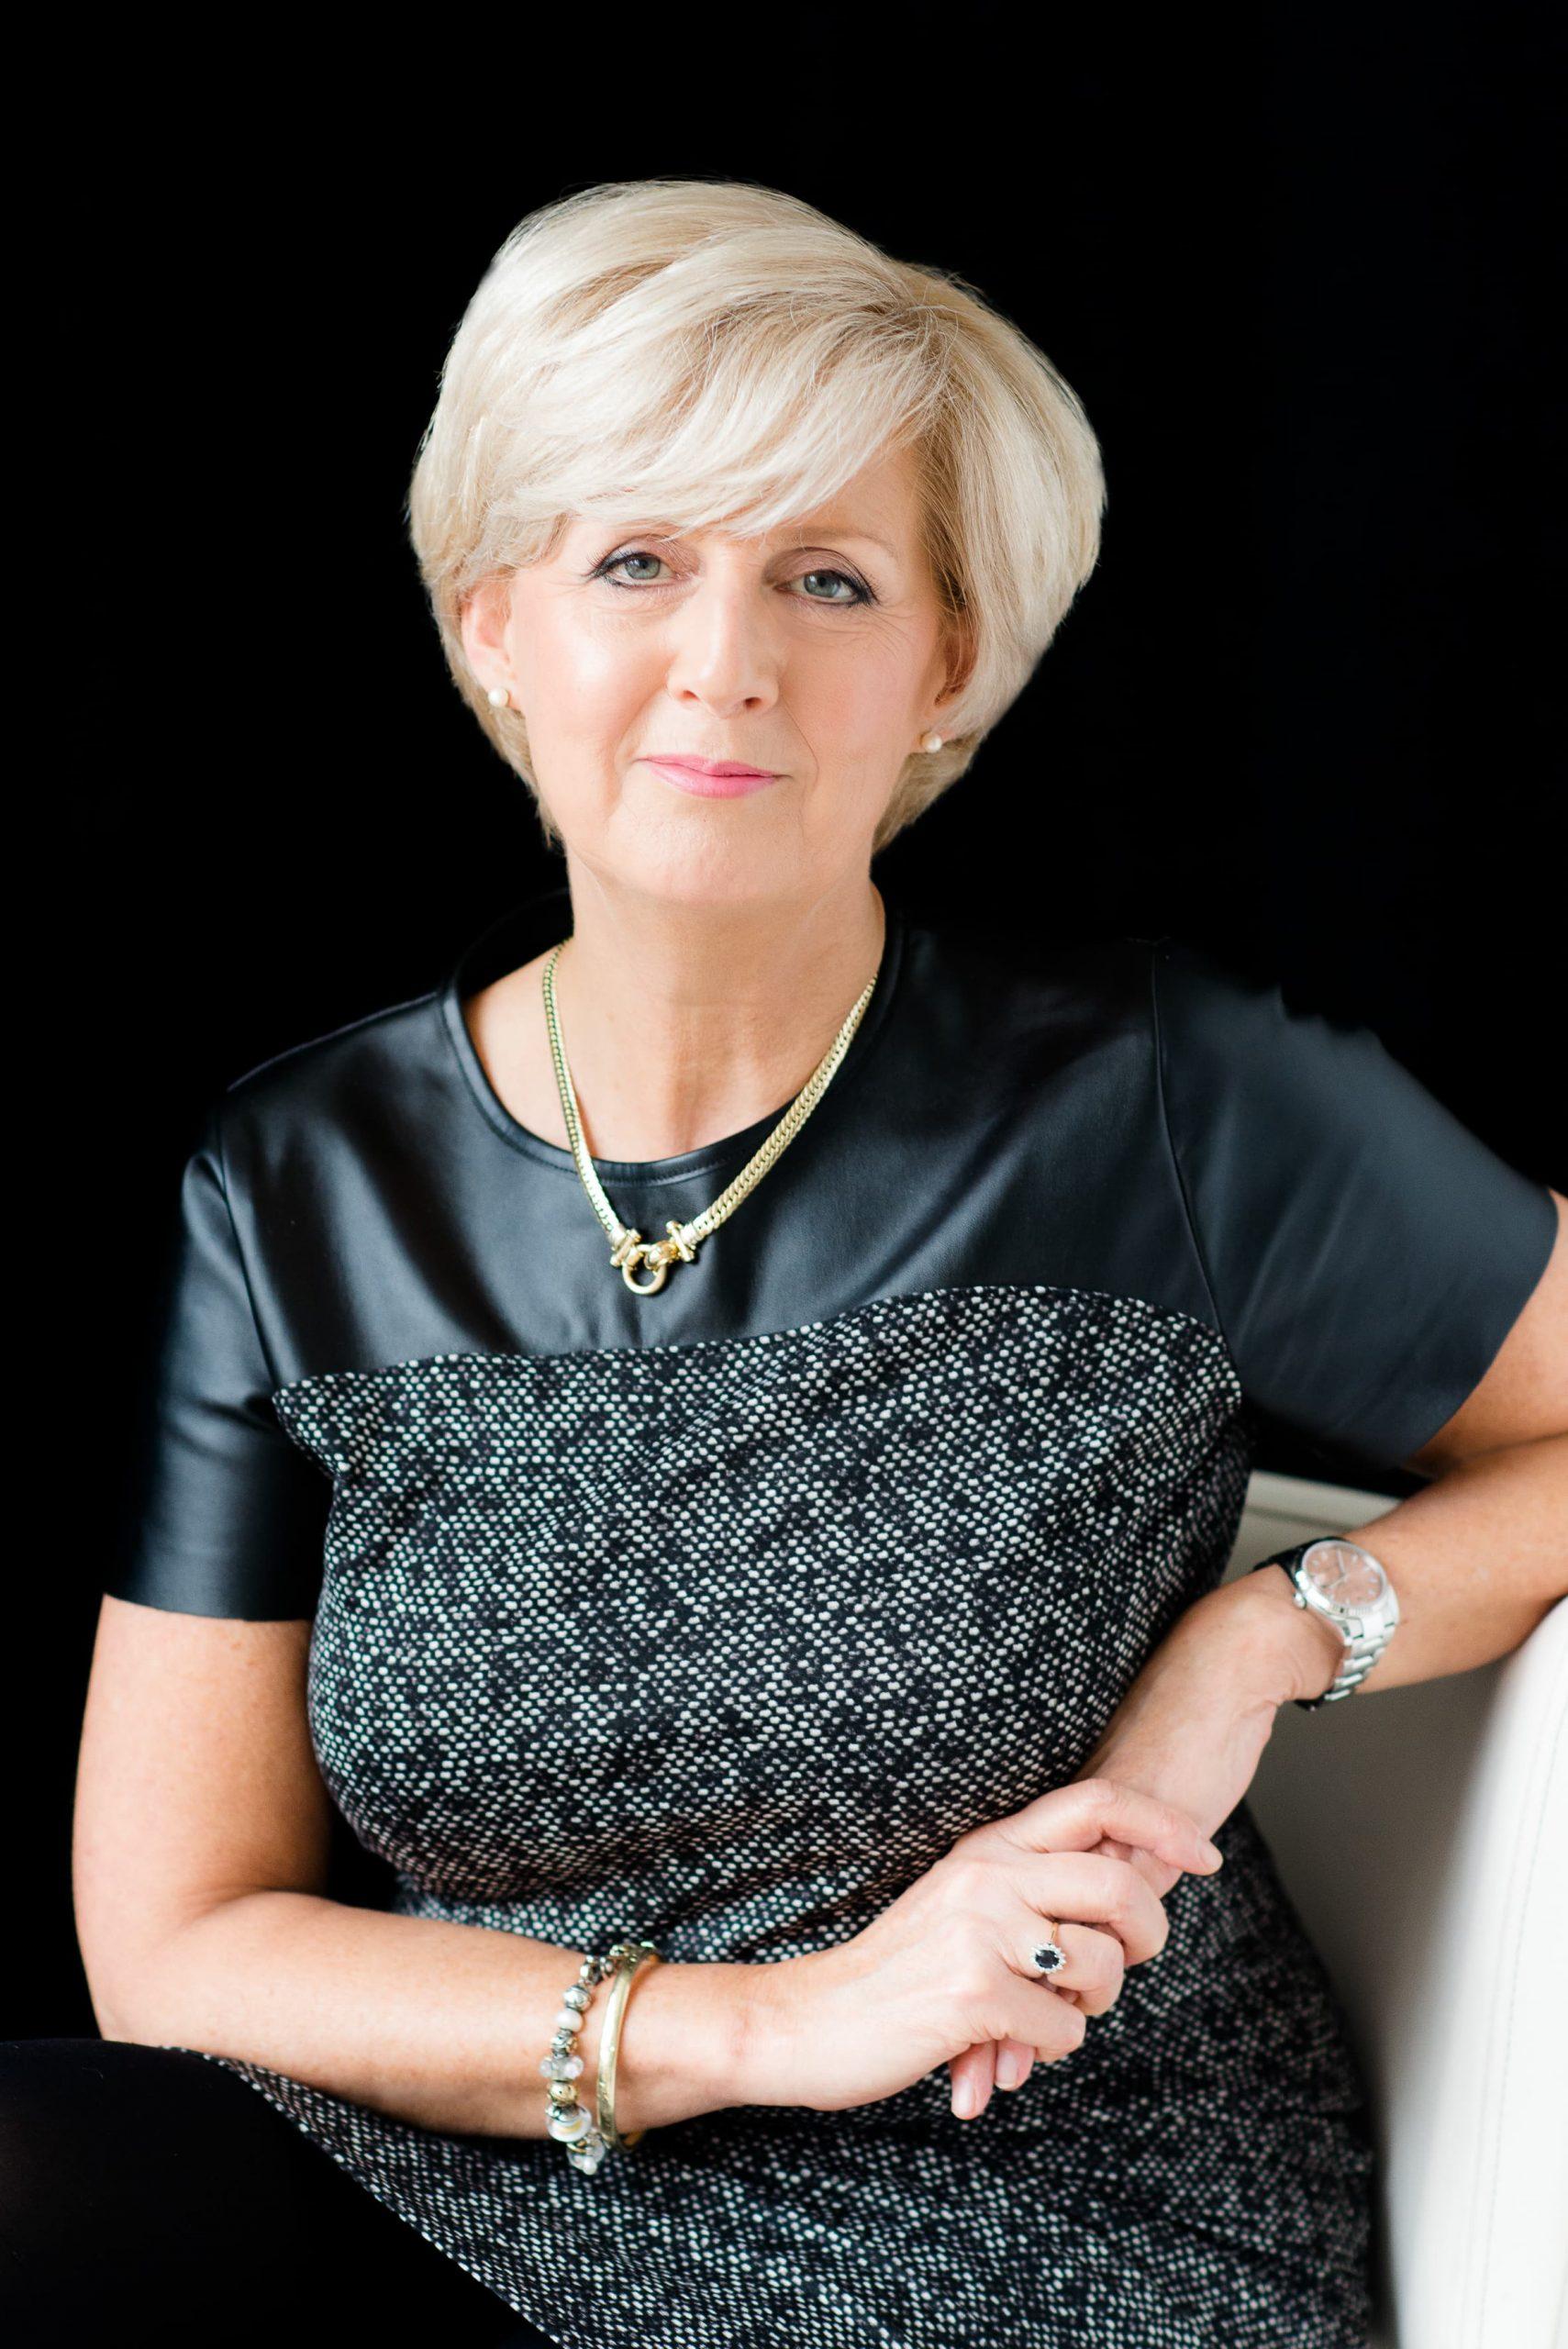 Beauty & Glamour zwarte t-shirt gouden ketting glamour make up